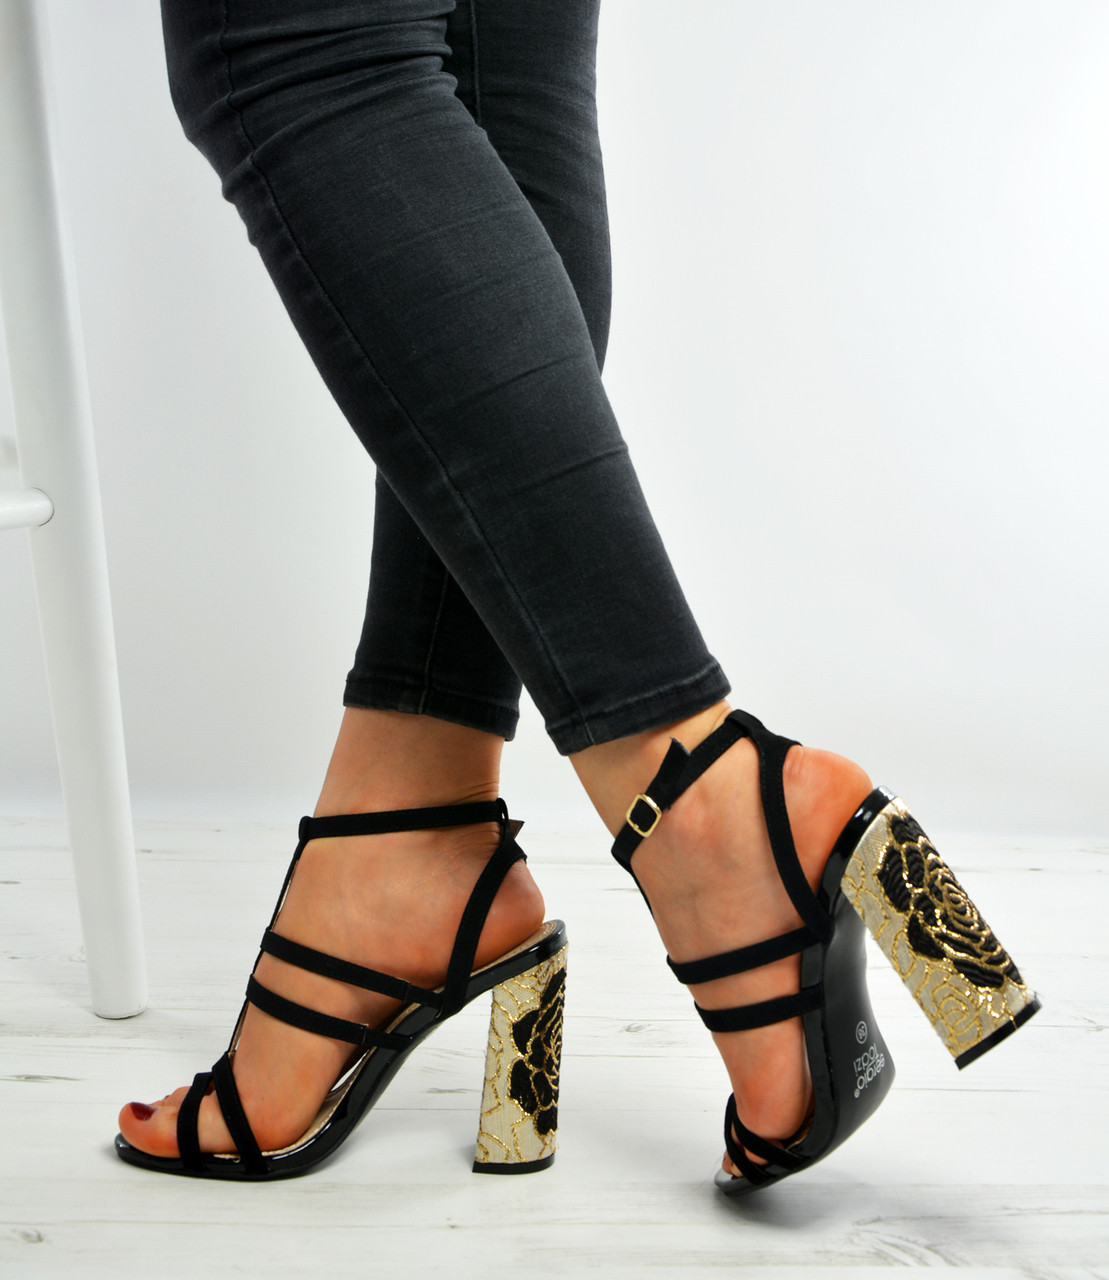 New Womens Ladies Black T Bar Floral Block Heels Sandals Shoes Size Uk 3-8